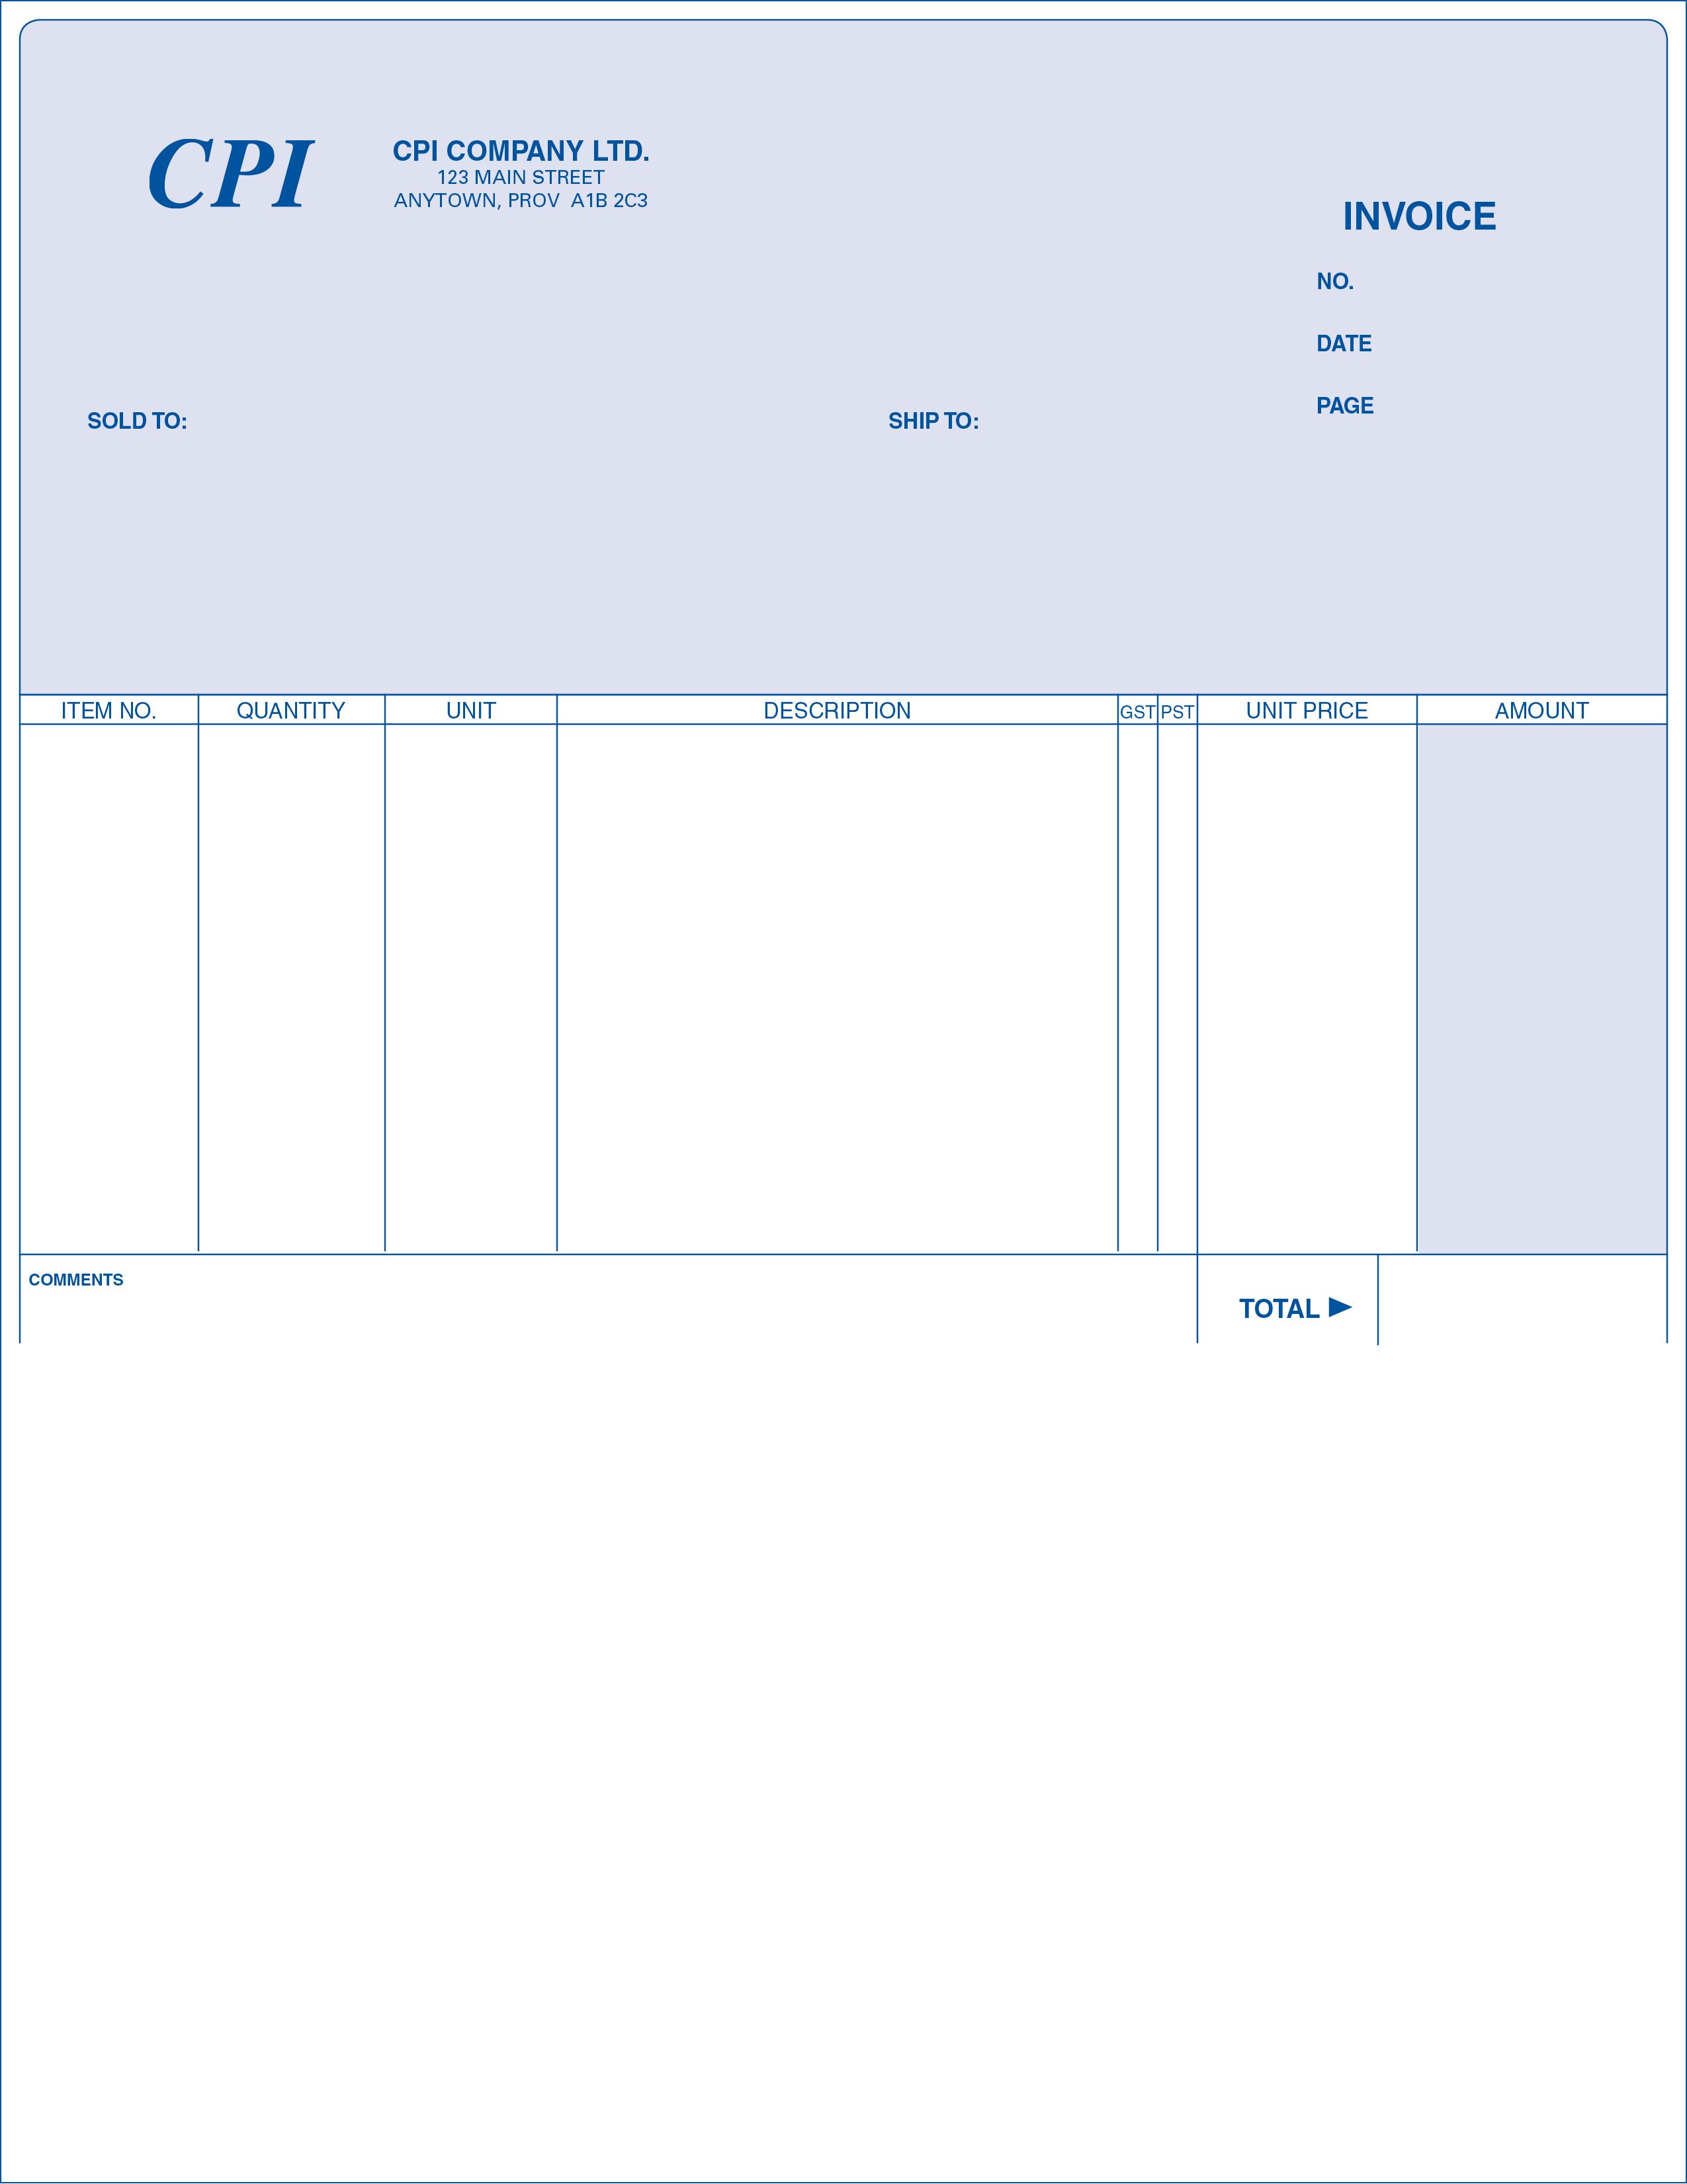 Invoice - Short Format